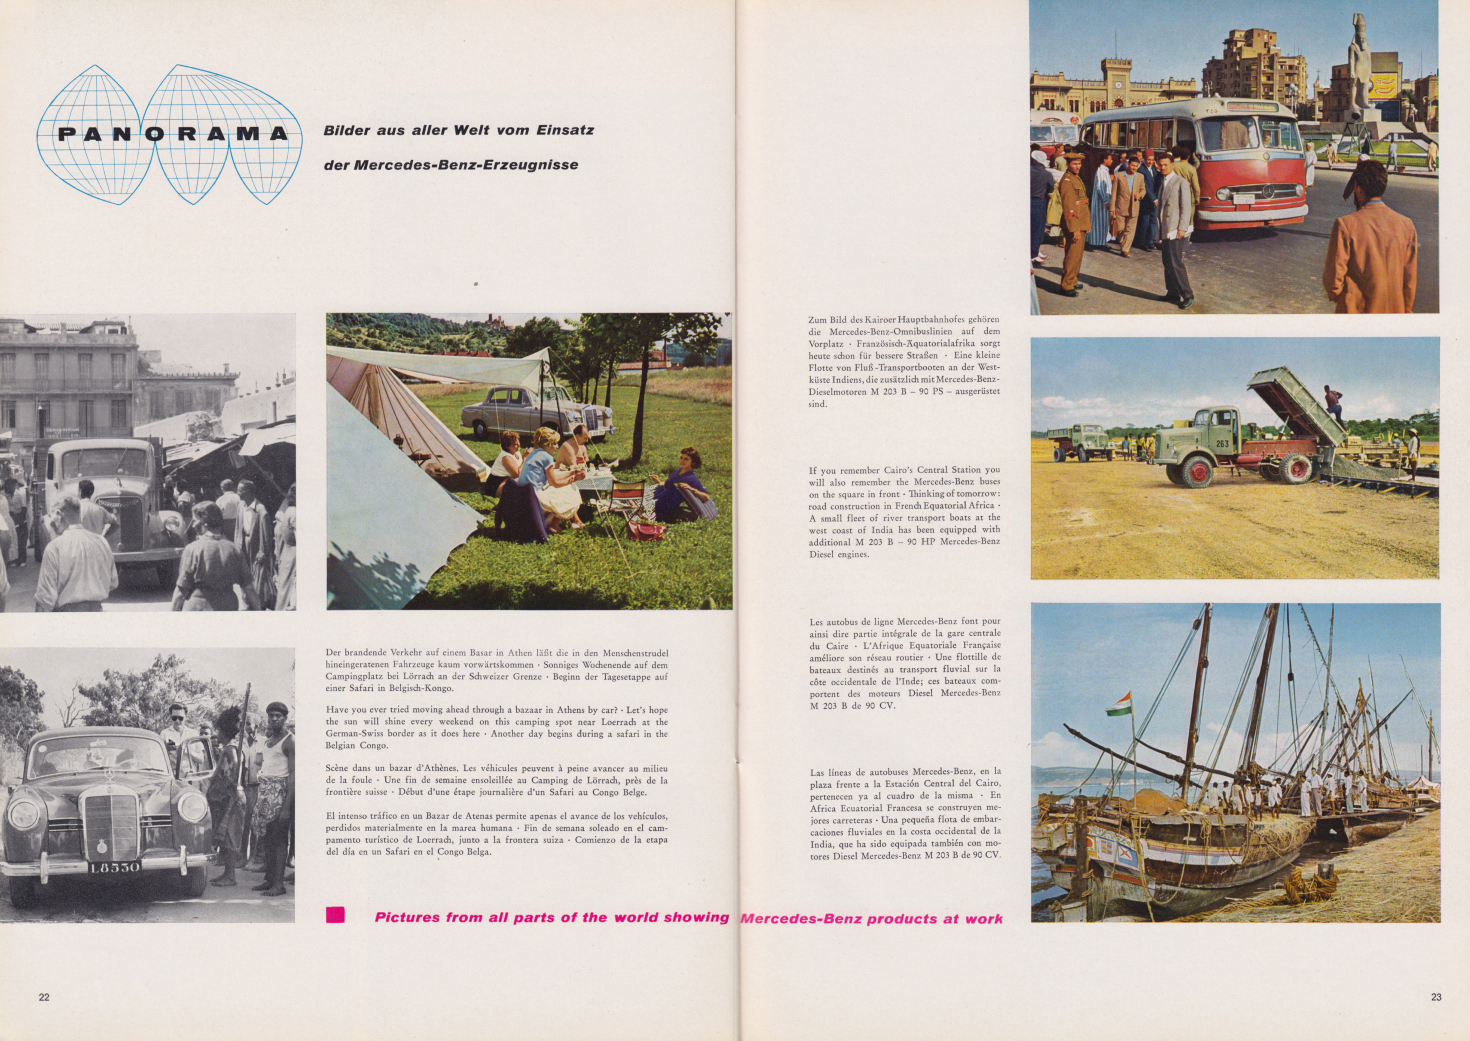 (REVISTA): Periódico In aller welt n.º 33 - Mercedes-Benz no mundo - 1959 - multilingue 012